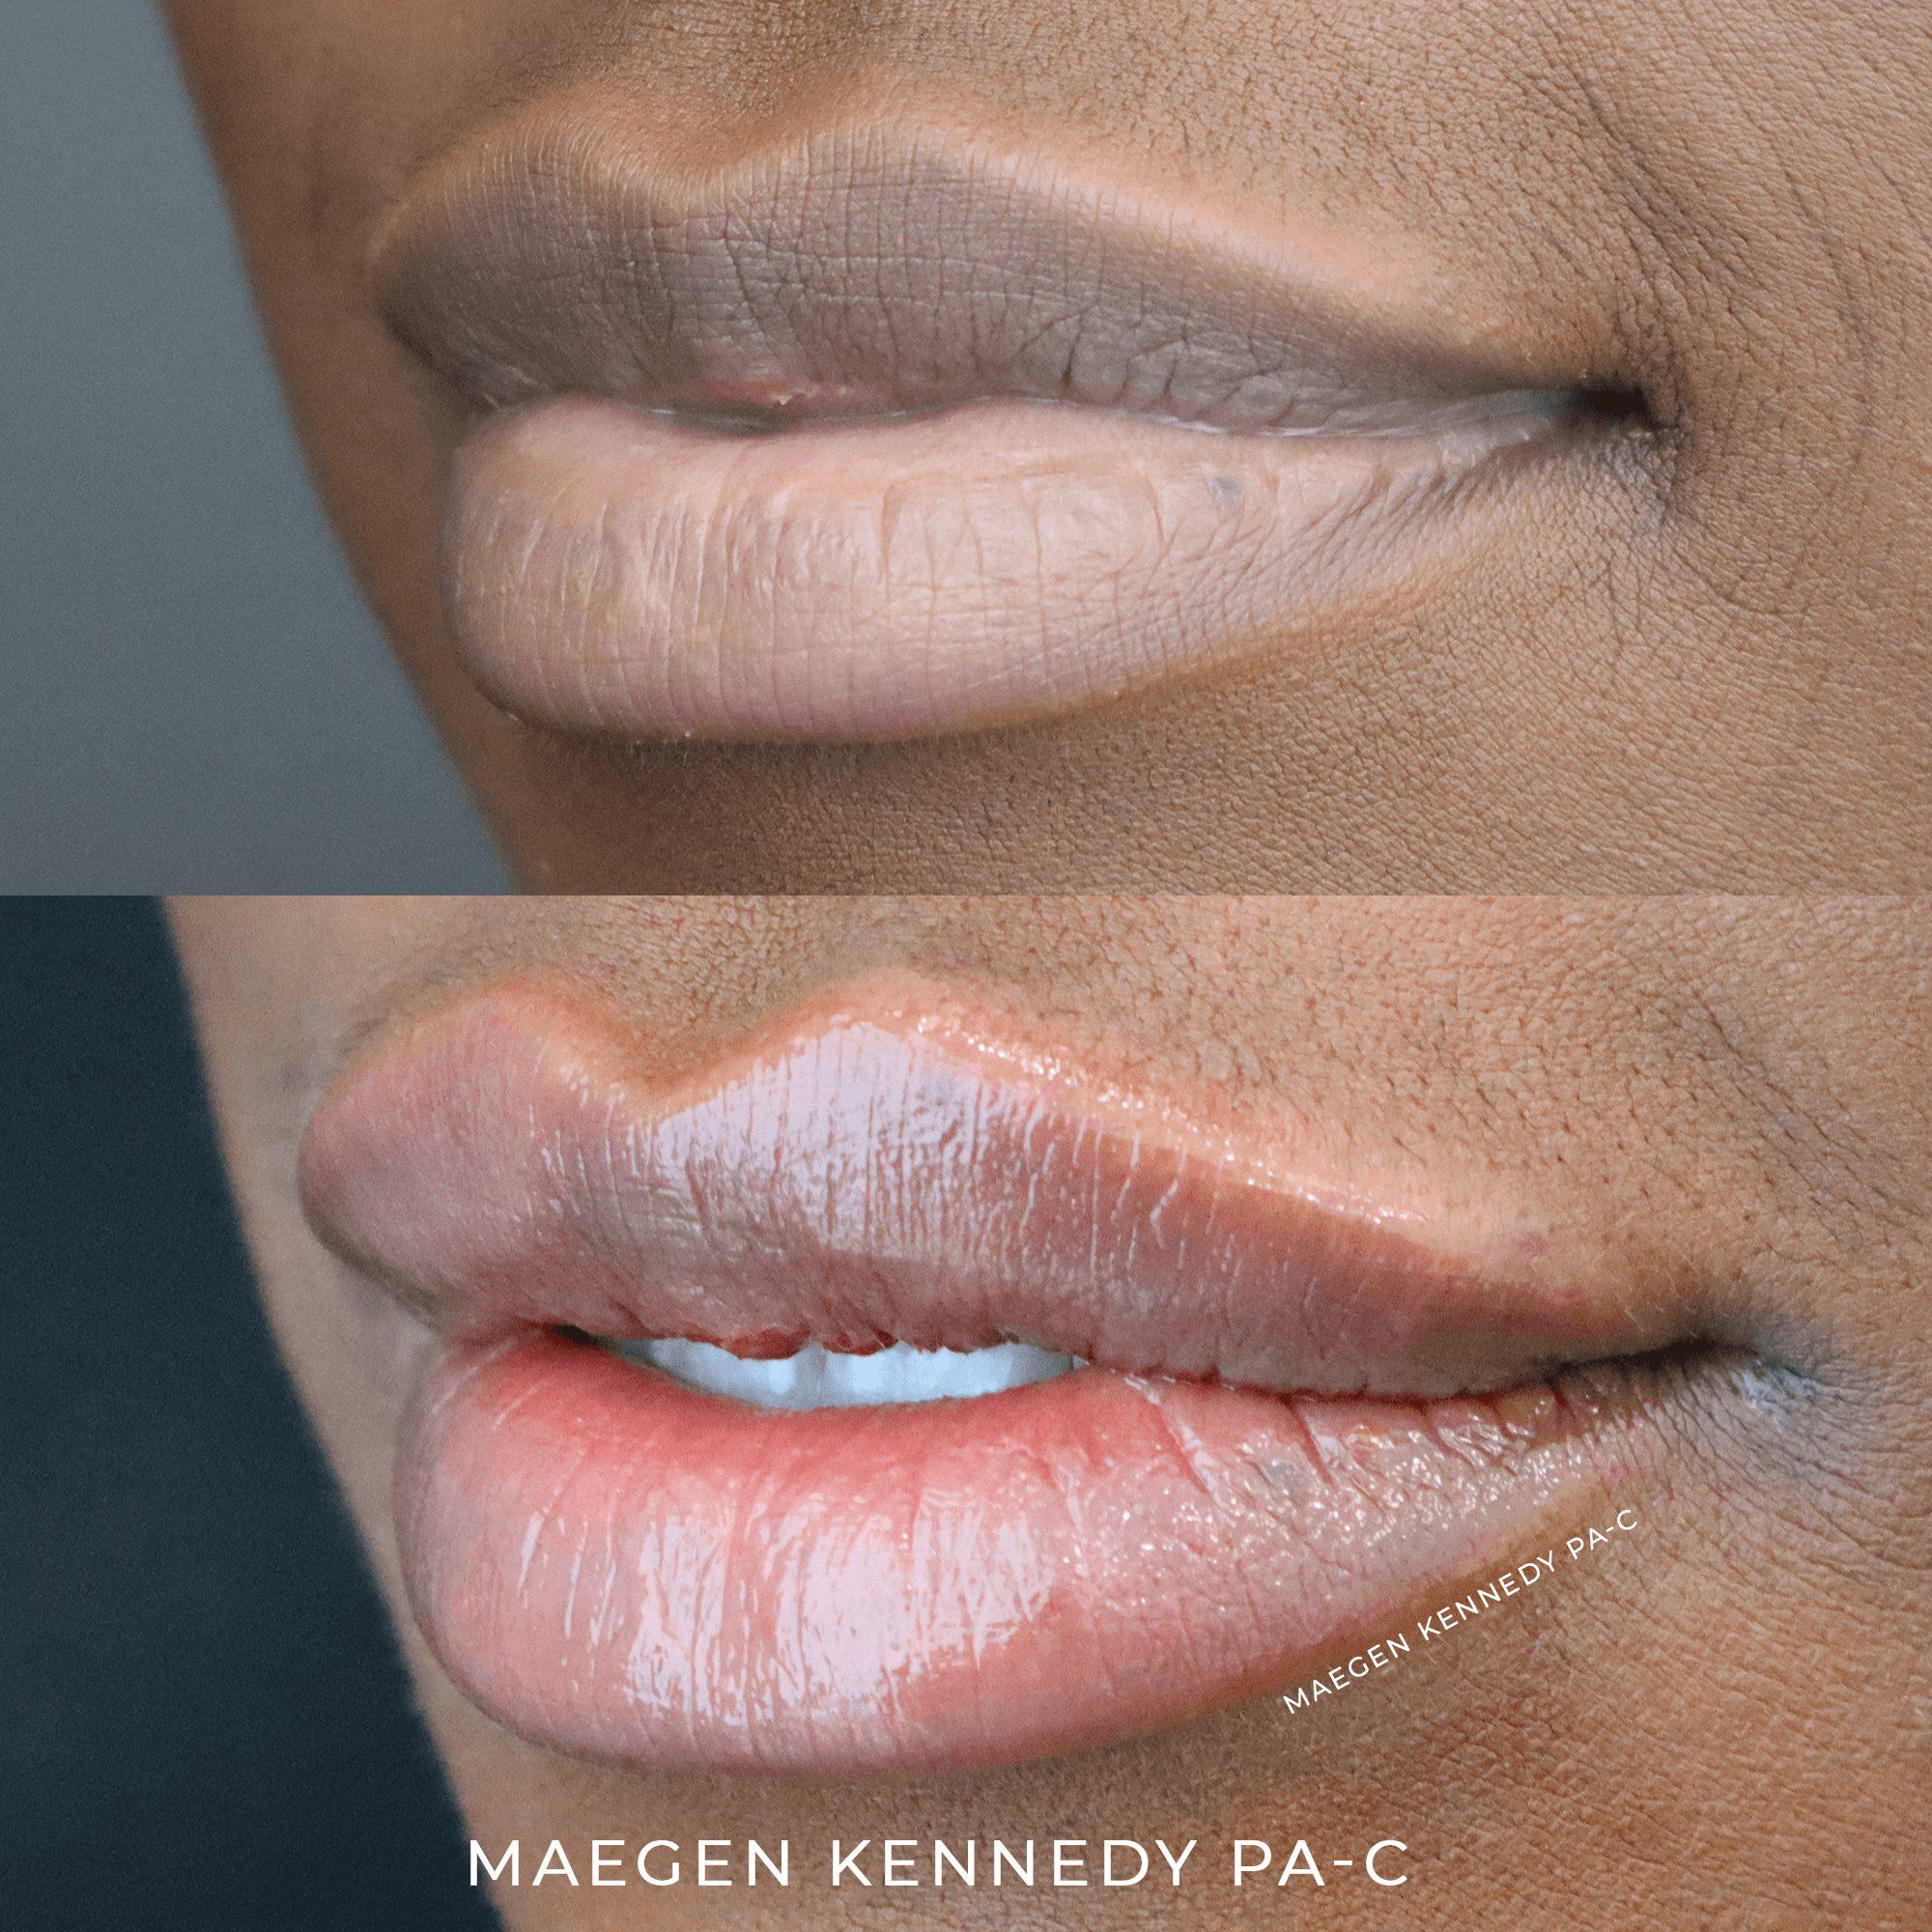 MK Pout Restylane Kysse - PA Maegen Kennedy Orlando, FL